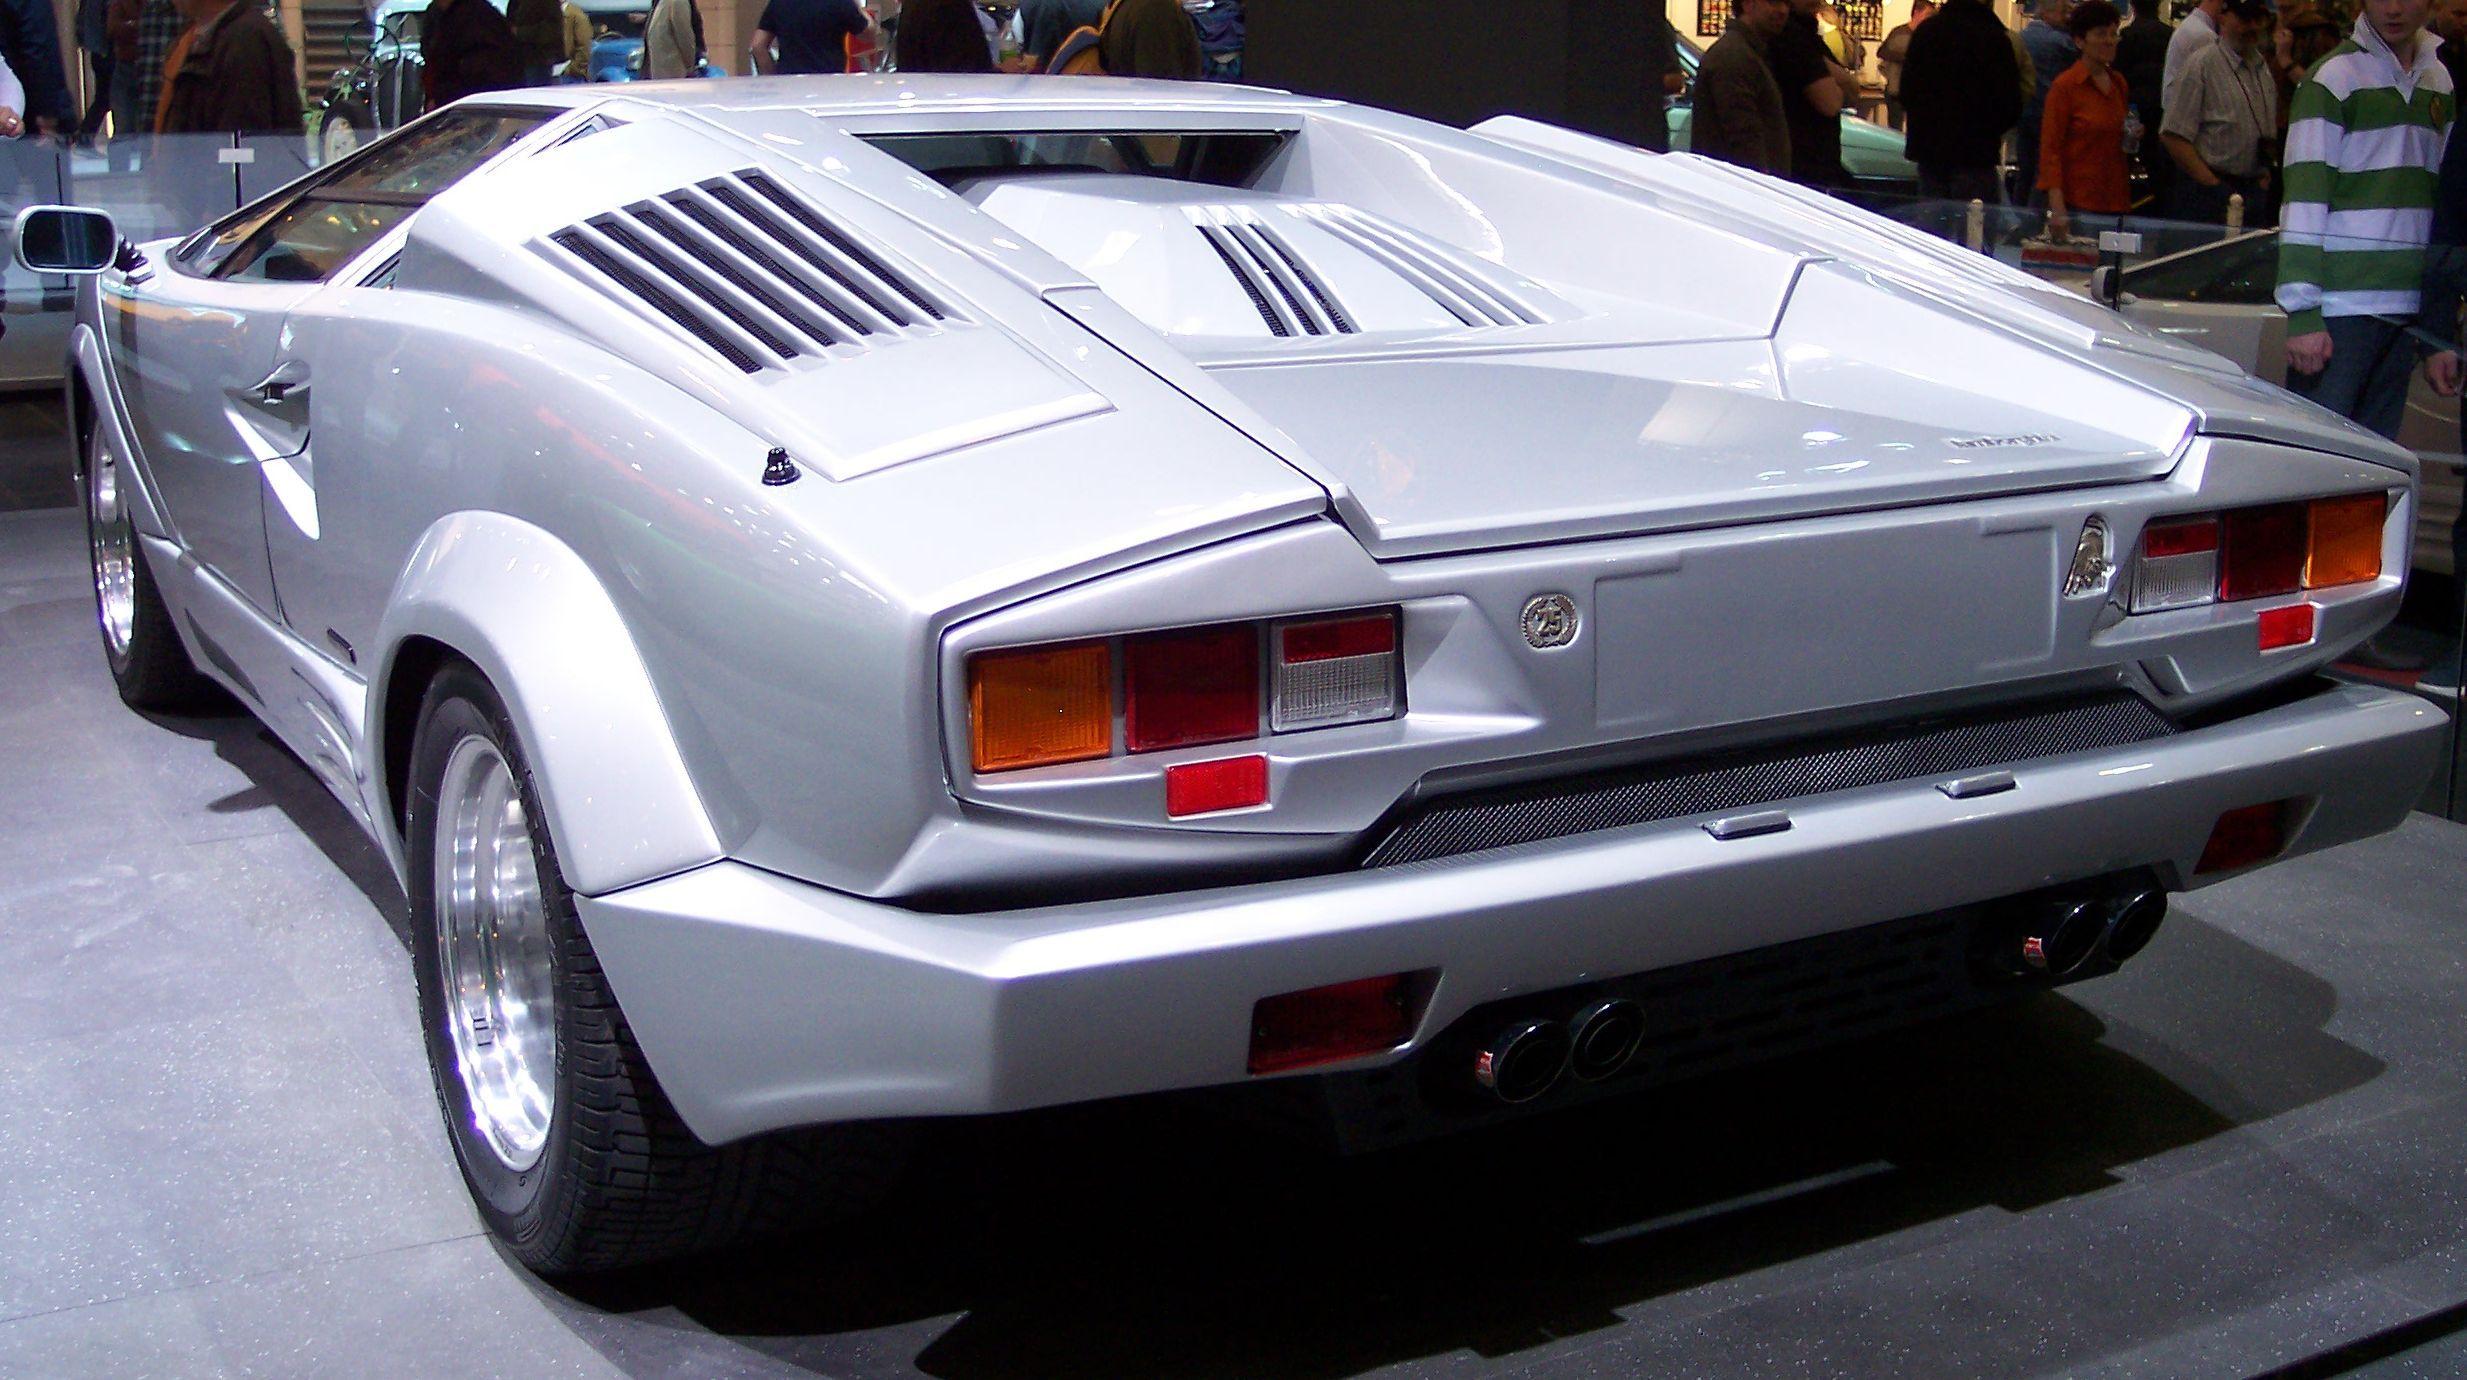 63b4999be86b9eaf72af2890234e861b Breathtaking Price Of Lamborghini Huracán Lp 610 4 Cars Trend